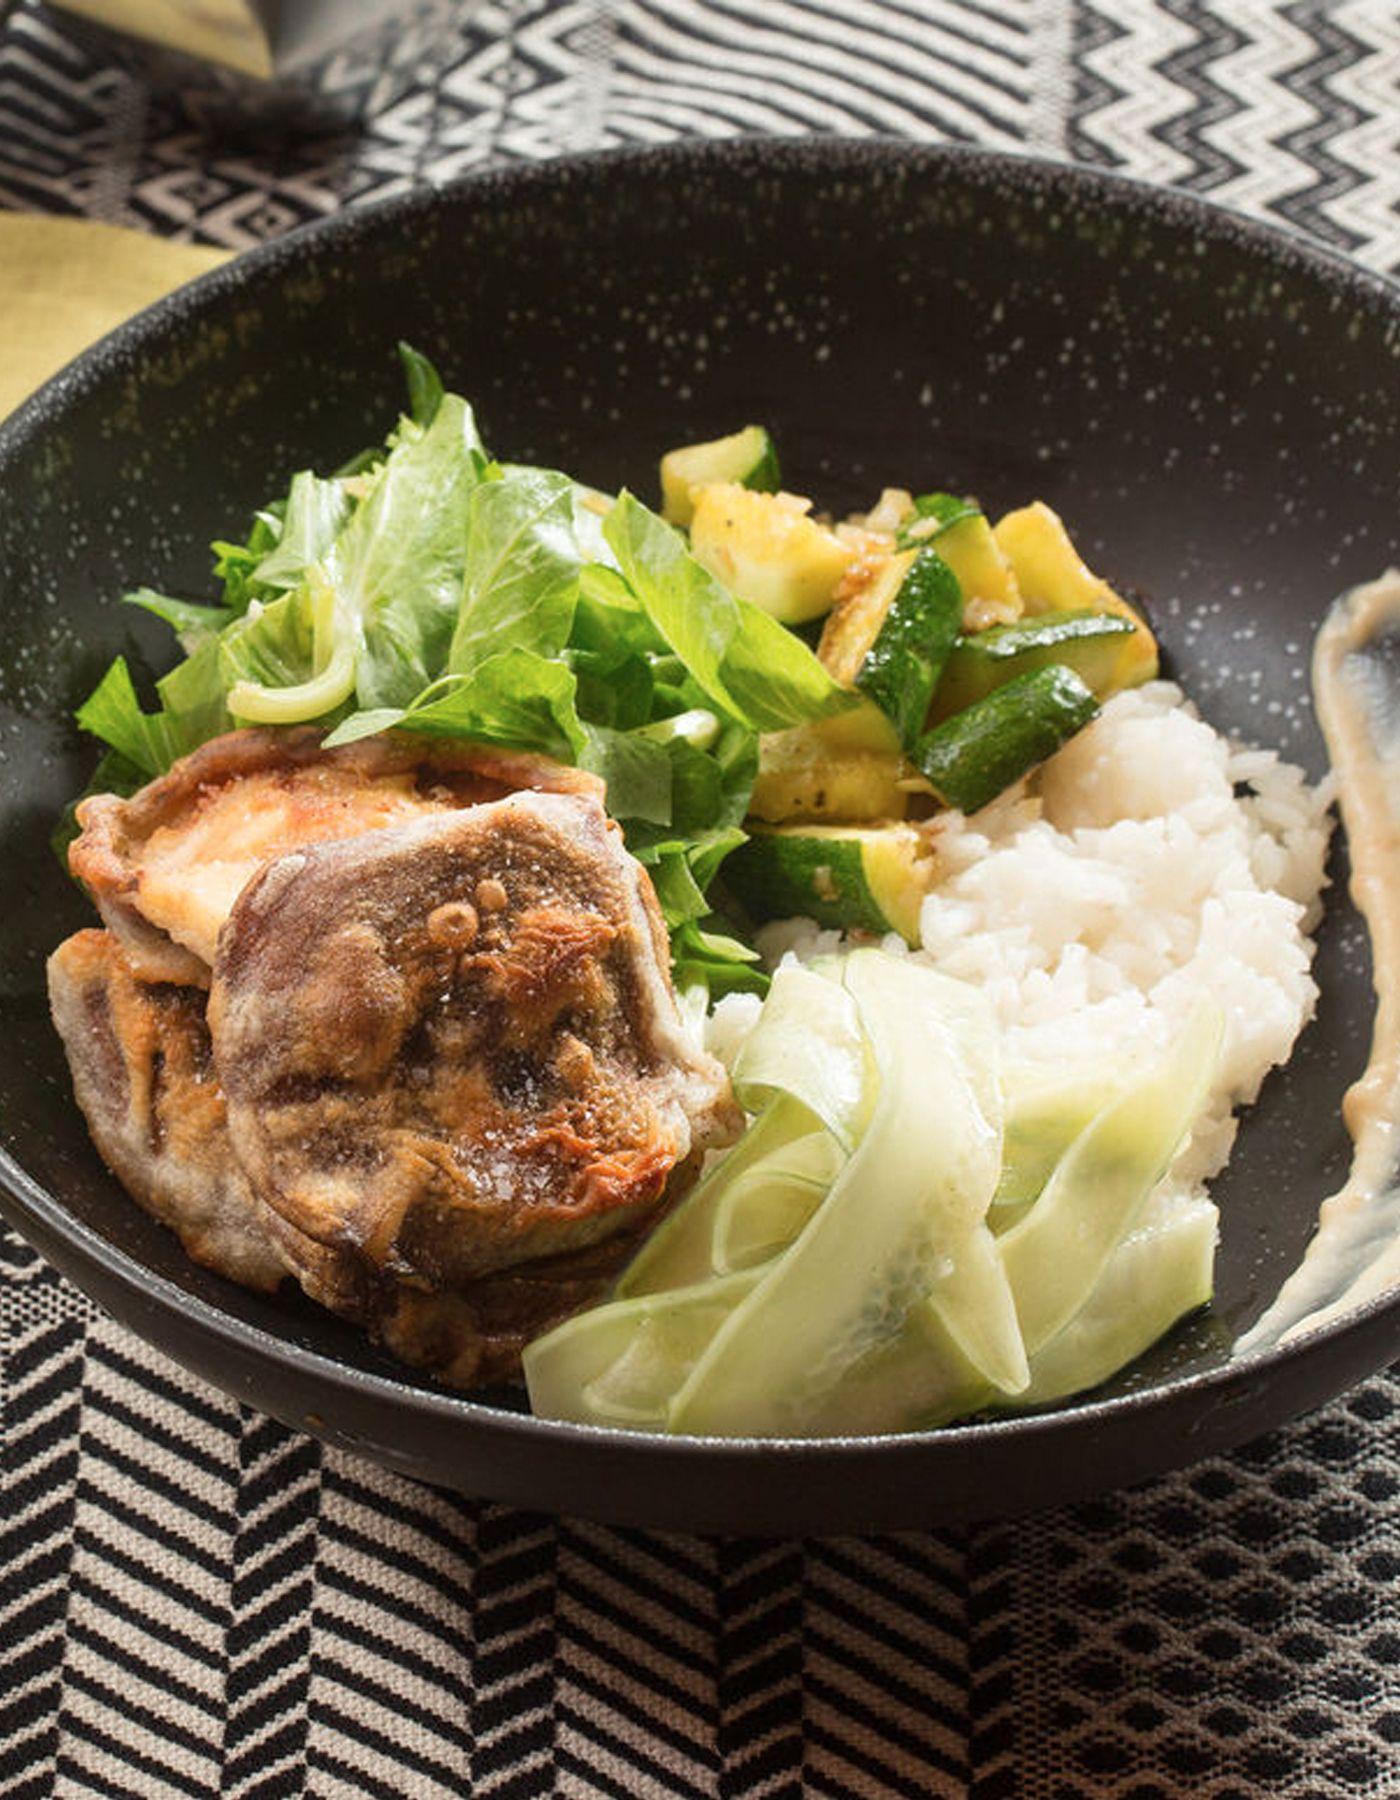 Blue apron tempura cod - Japanese Rice Bowl Mushroom Tempura With Zucchini Marinated Cucumber